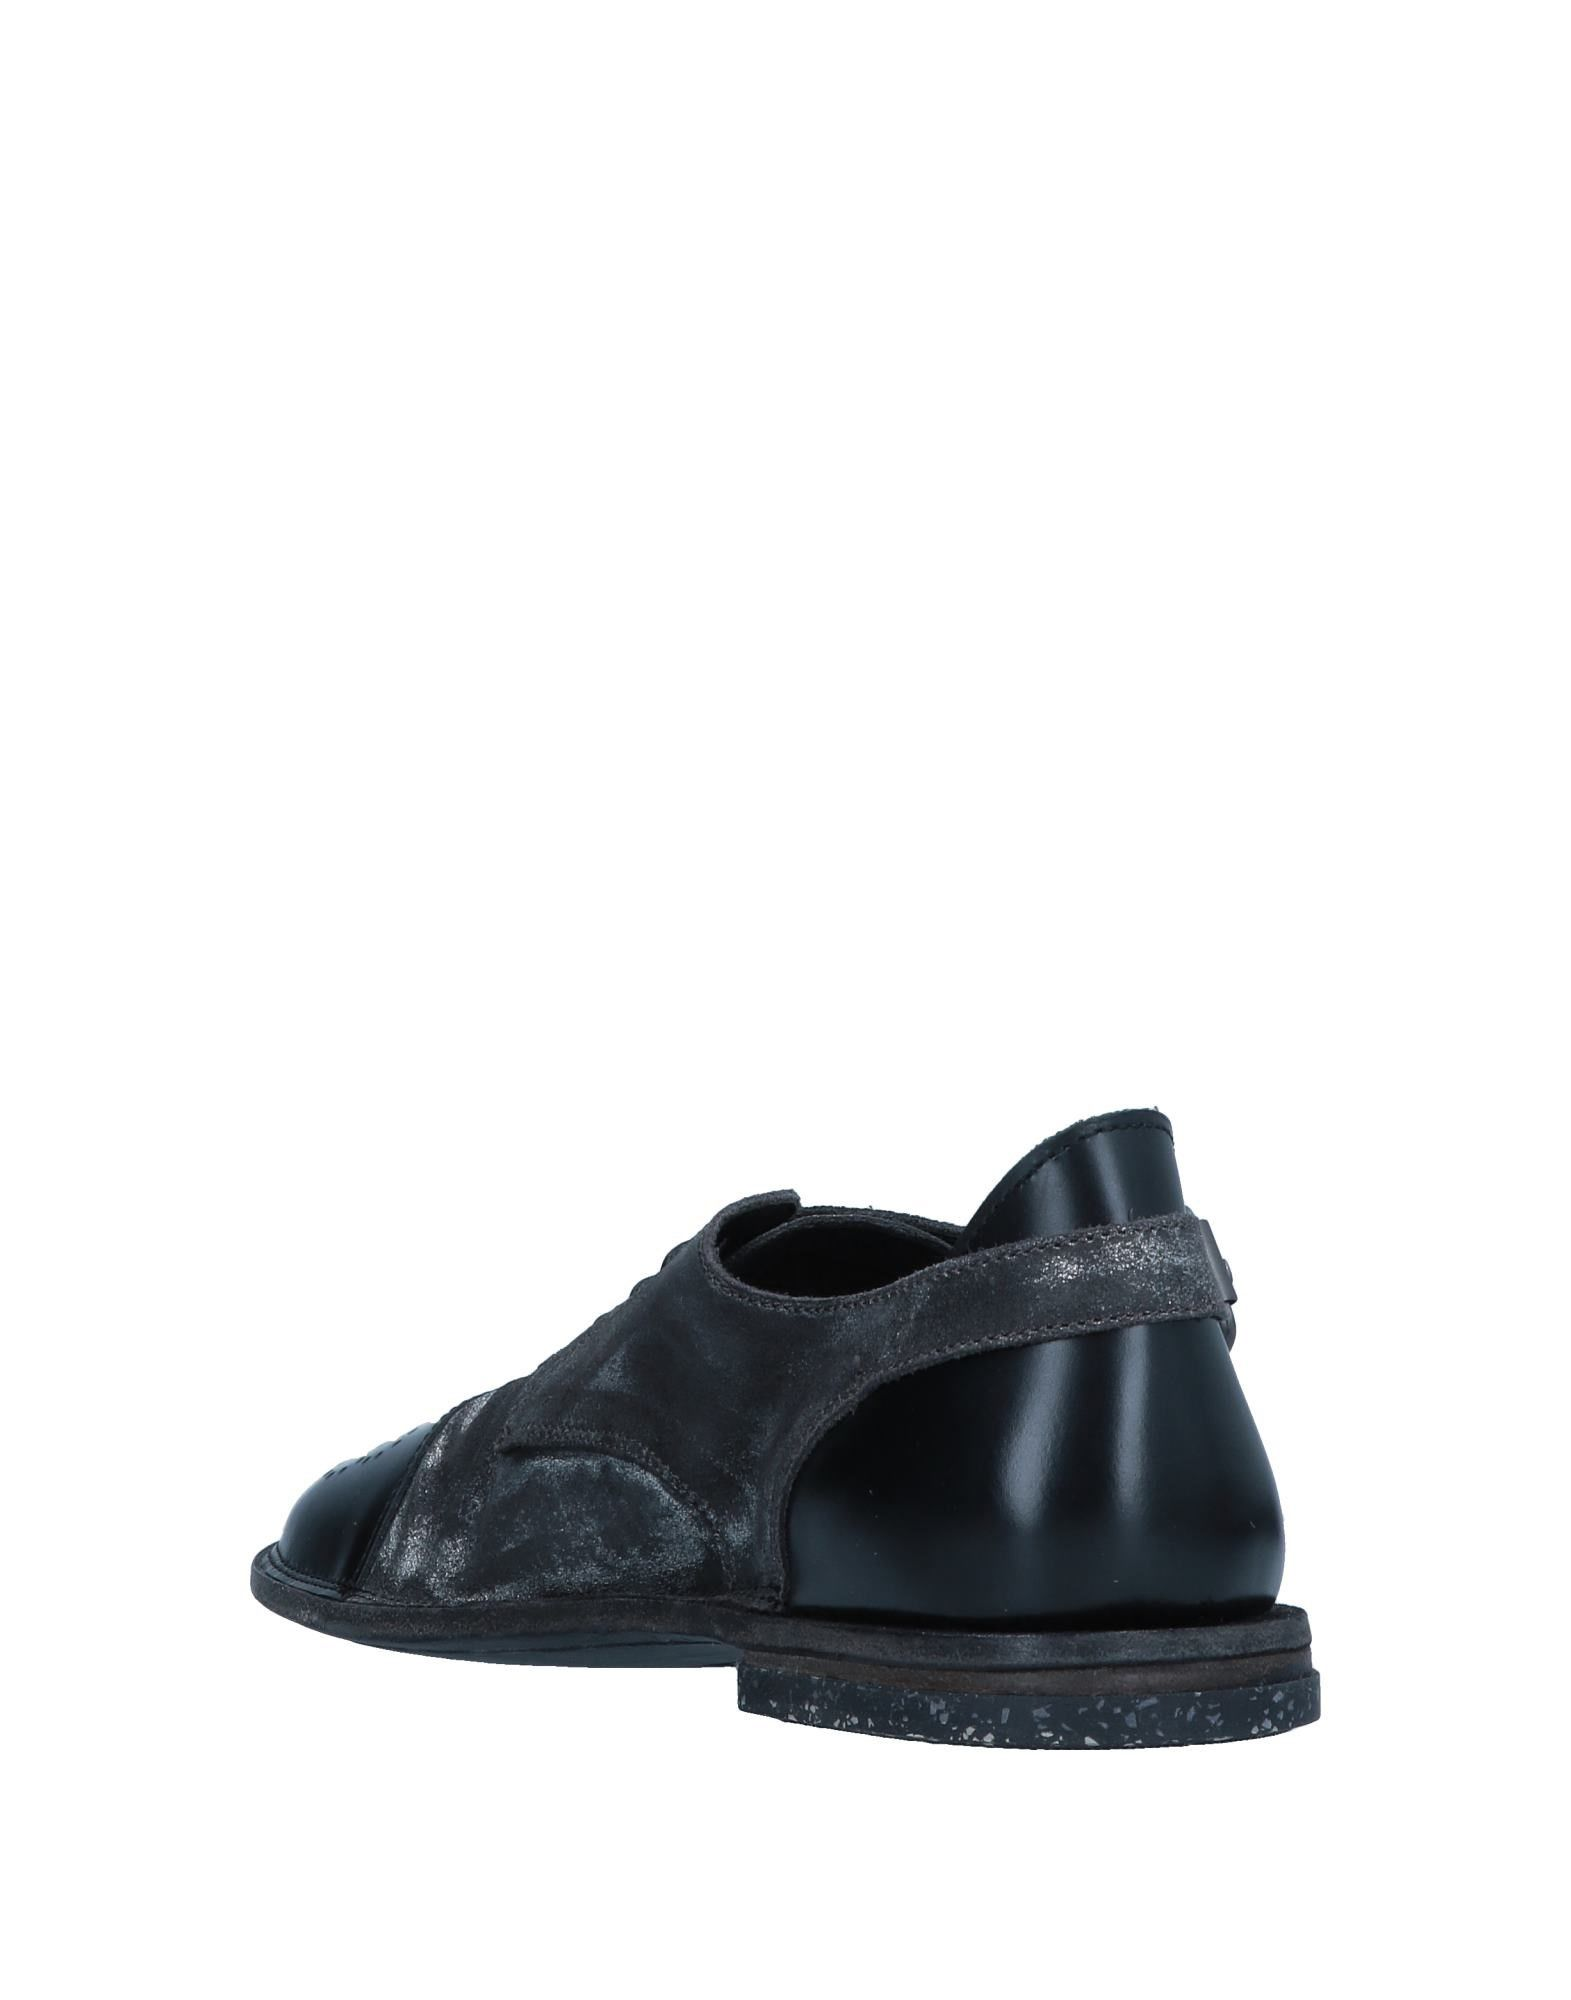 Stilvolle Pantanetti billige Schuhe Pantanetti Stilvolle Schnürschuhe Damen  11545767AV 1a1640